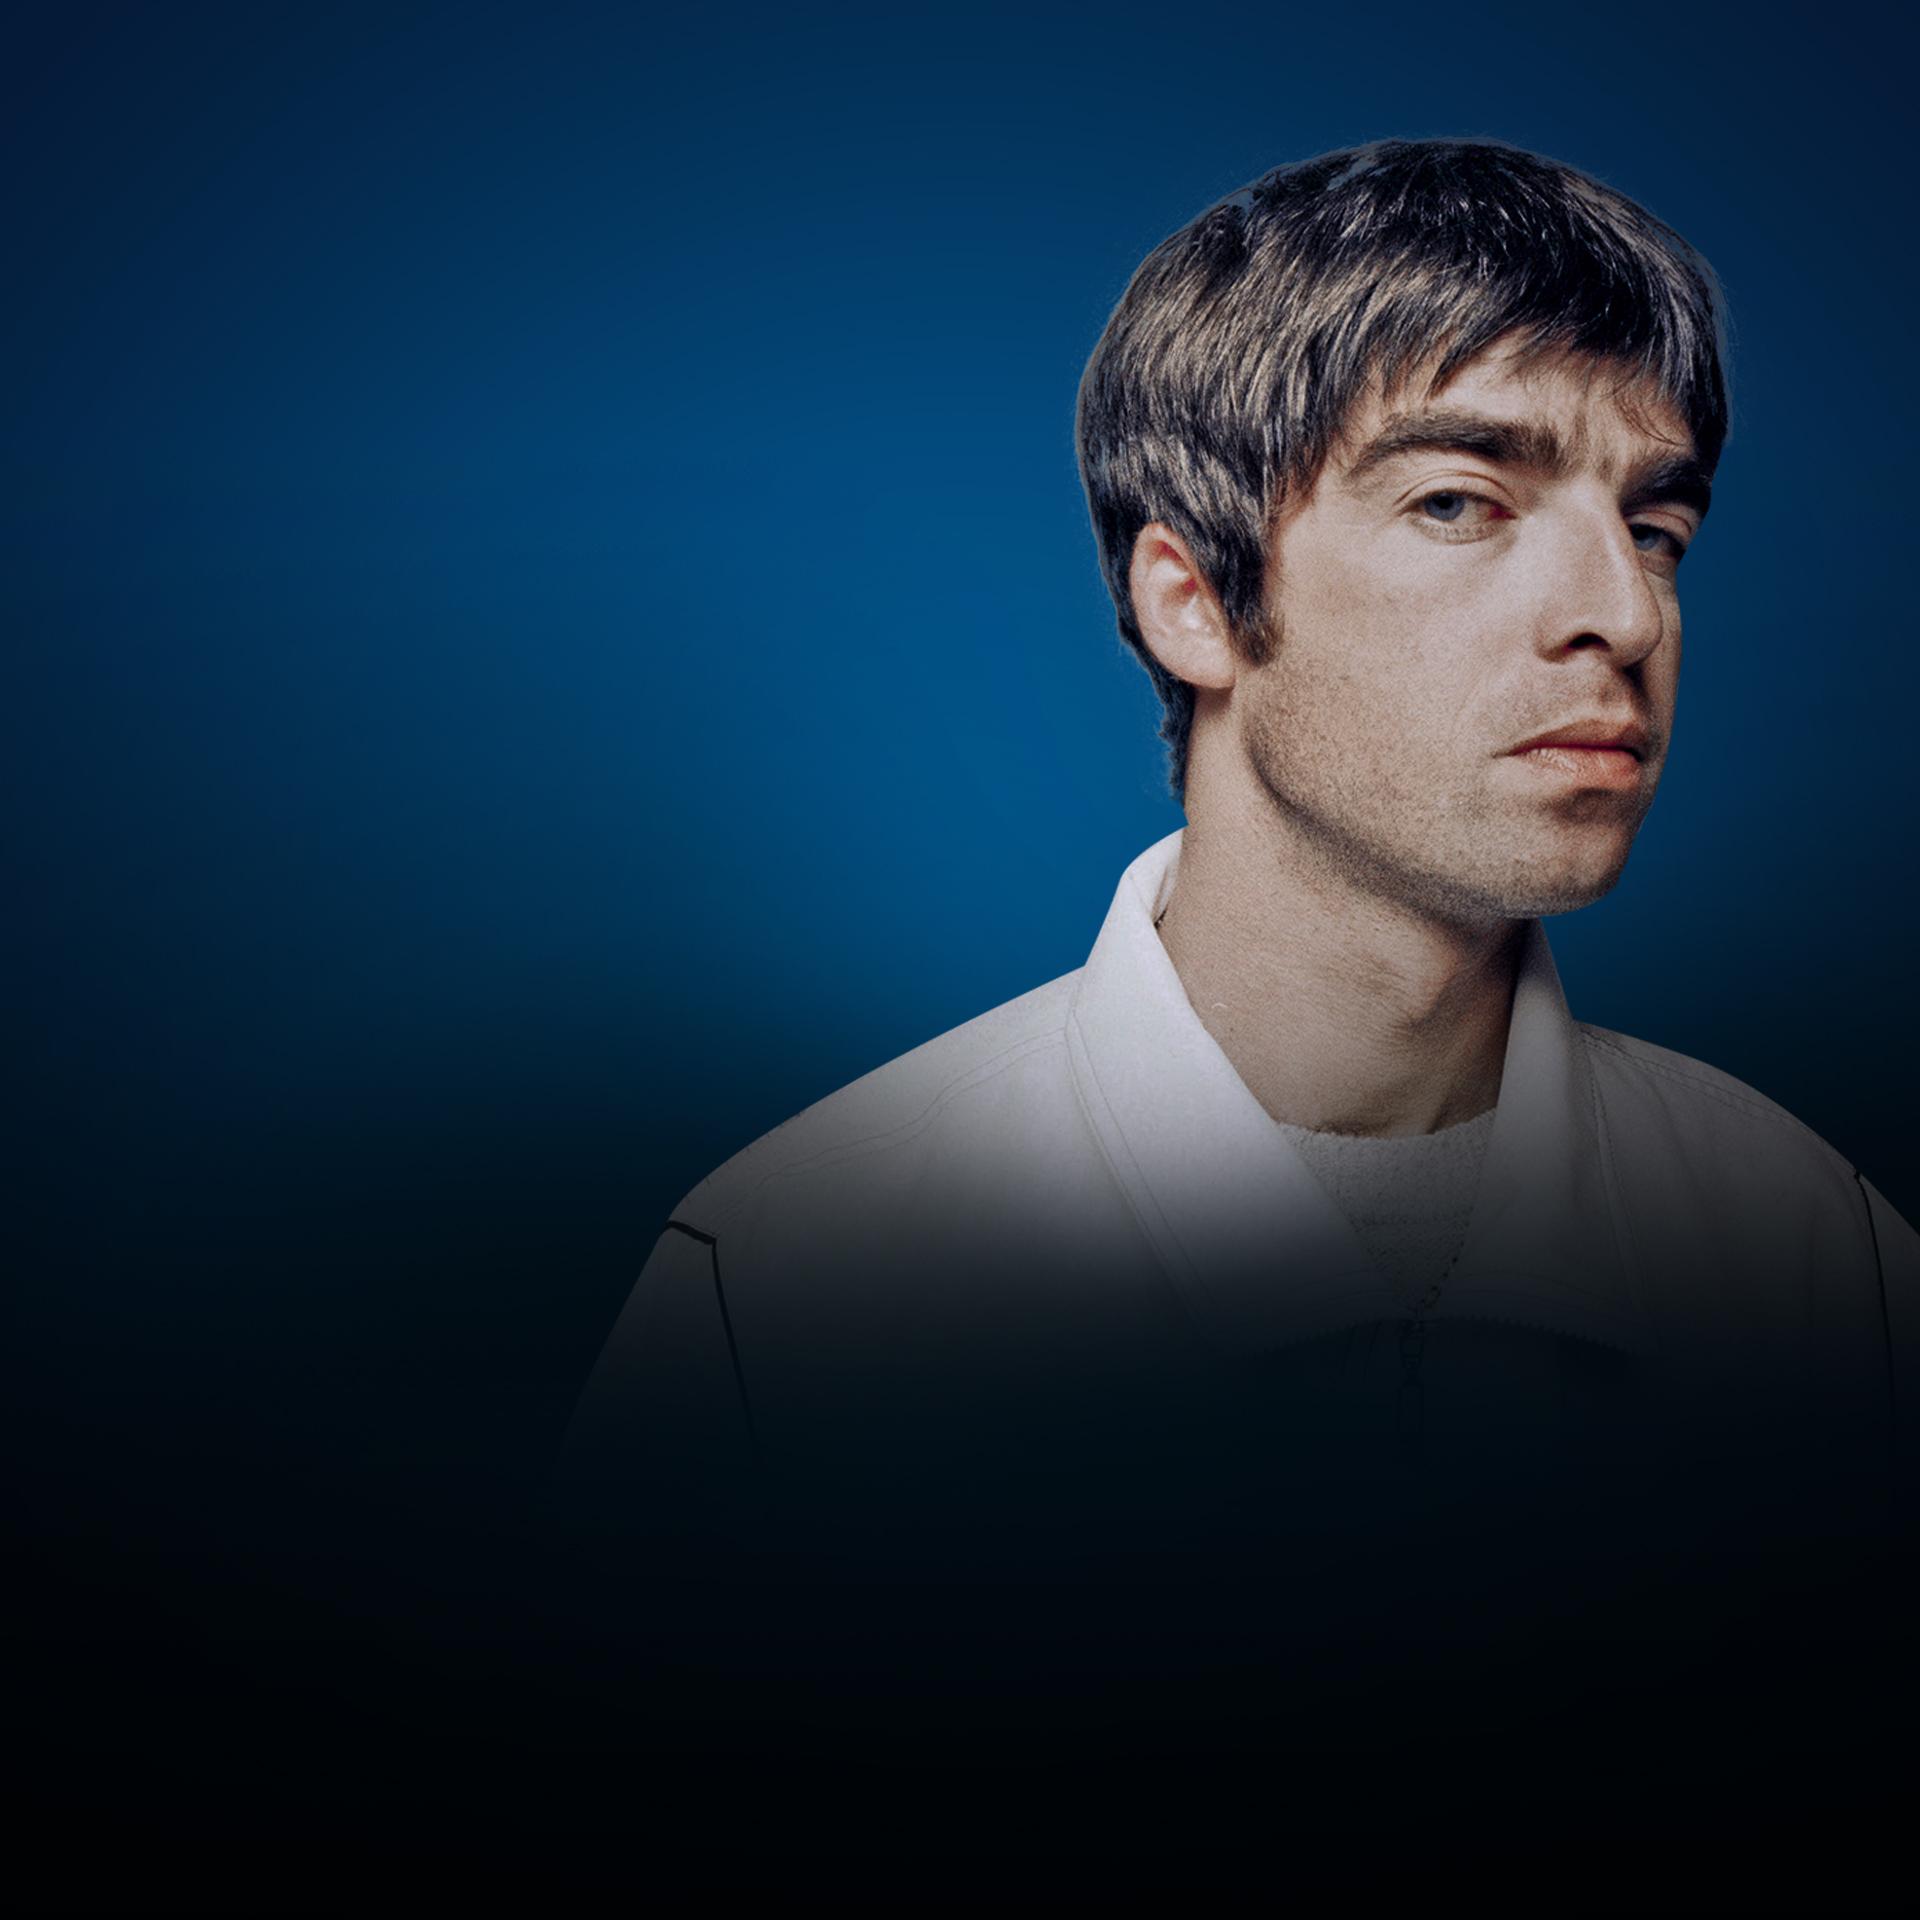 Noel Gallagher Guest DJ